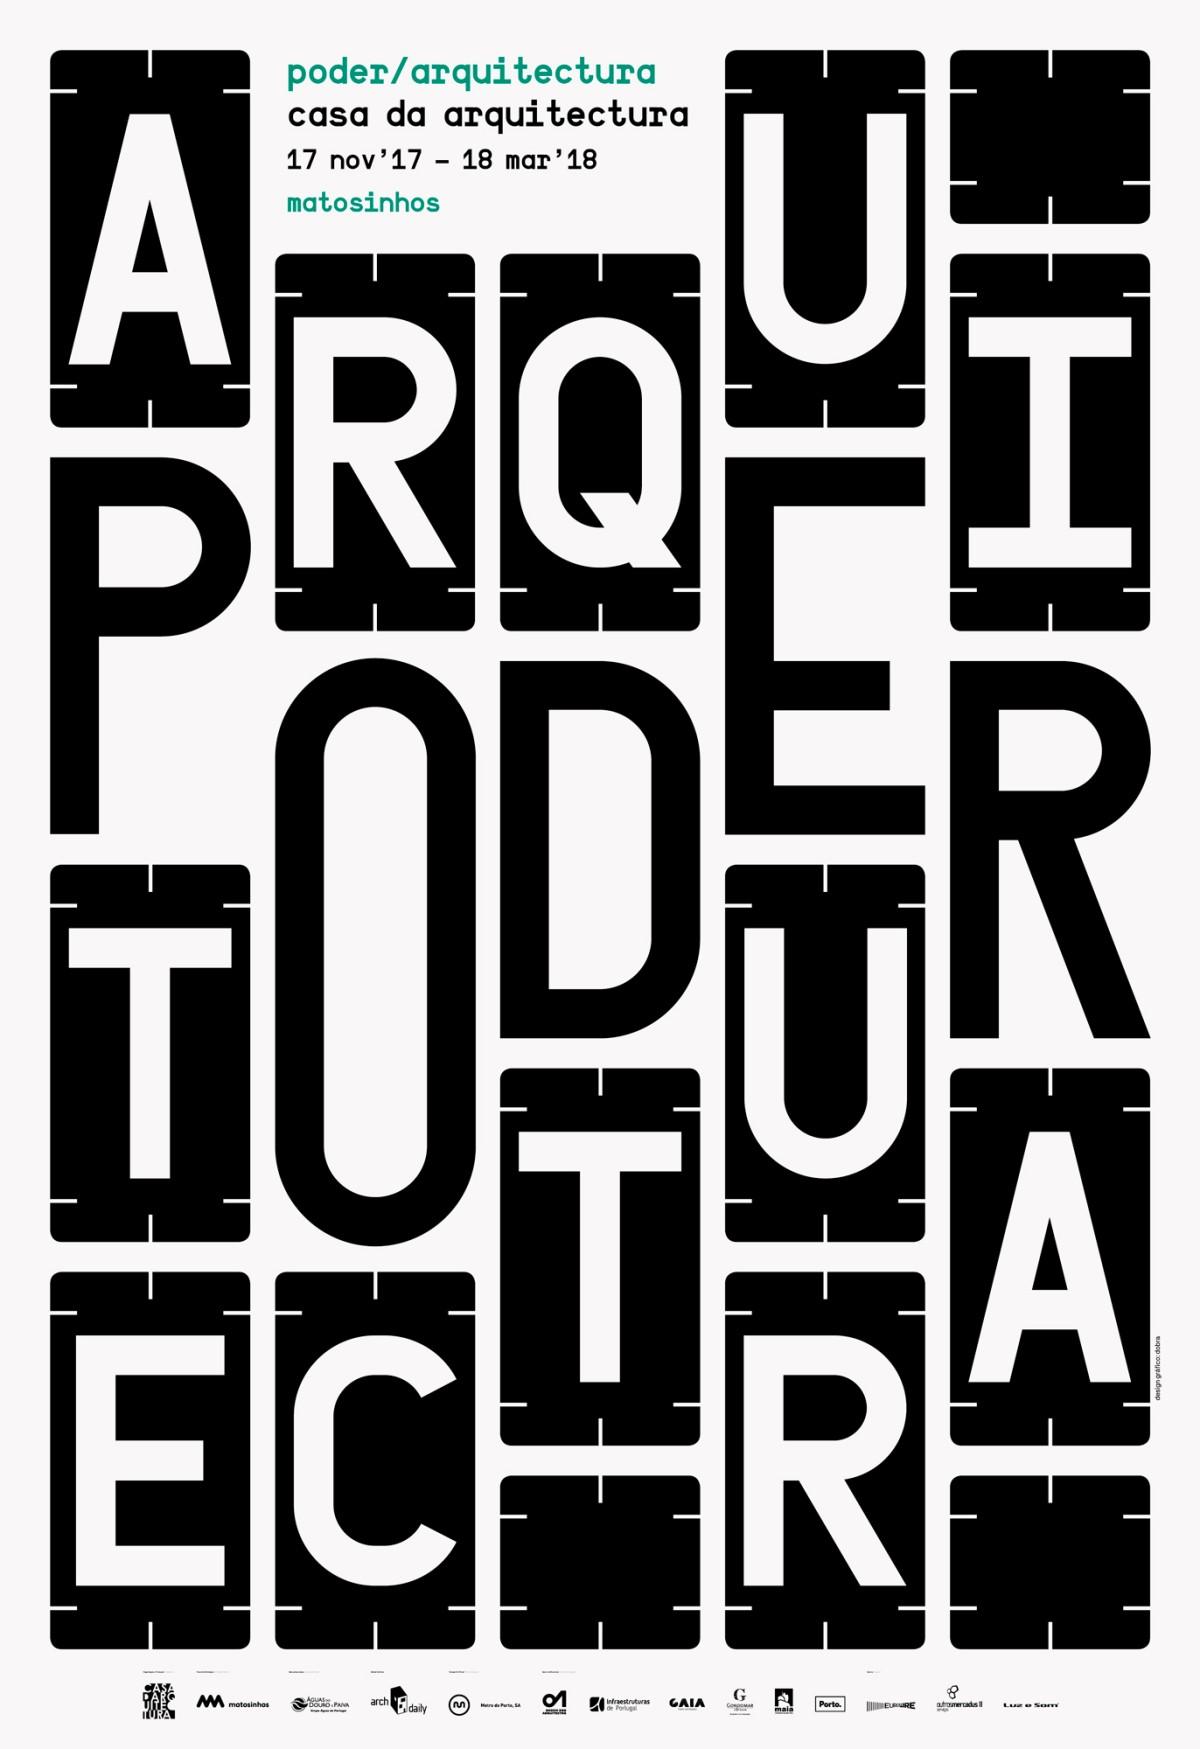 Power/Architecture Exhibition Image:1.1